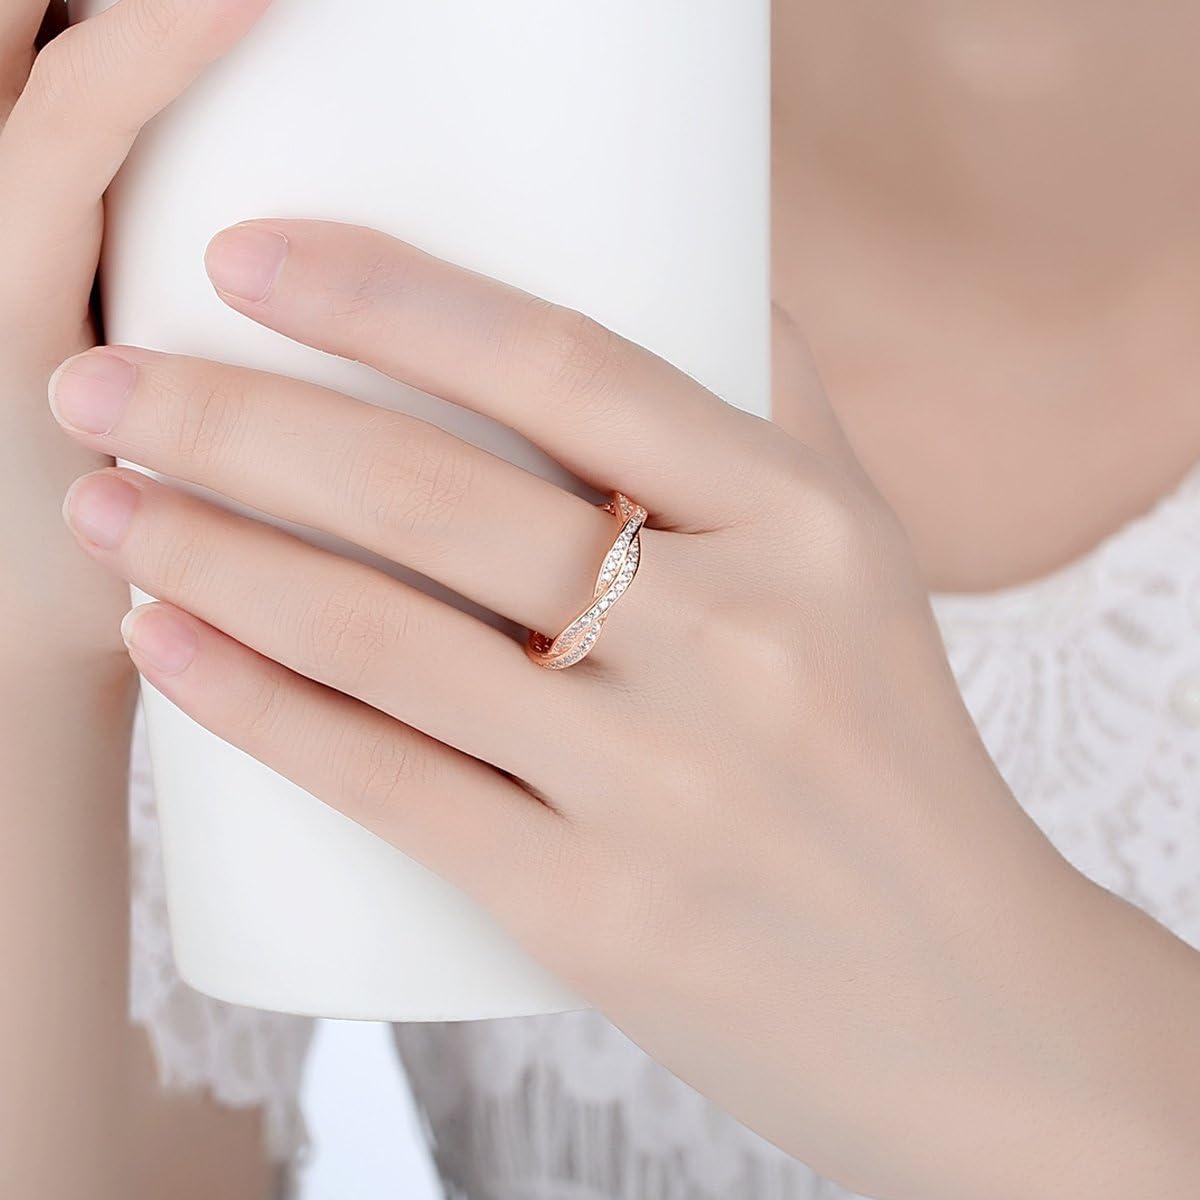 Presentski Donna Cubic Zirconia 925 Silver Rose Wedding Ring placcato oro